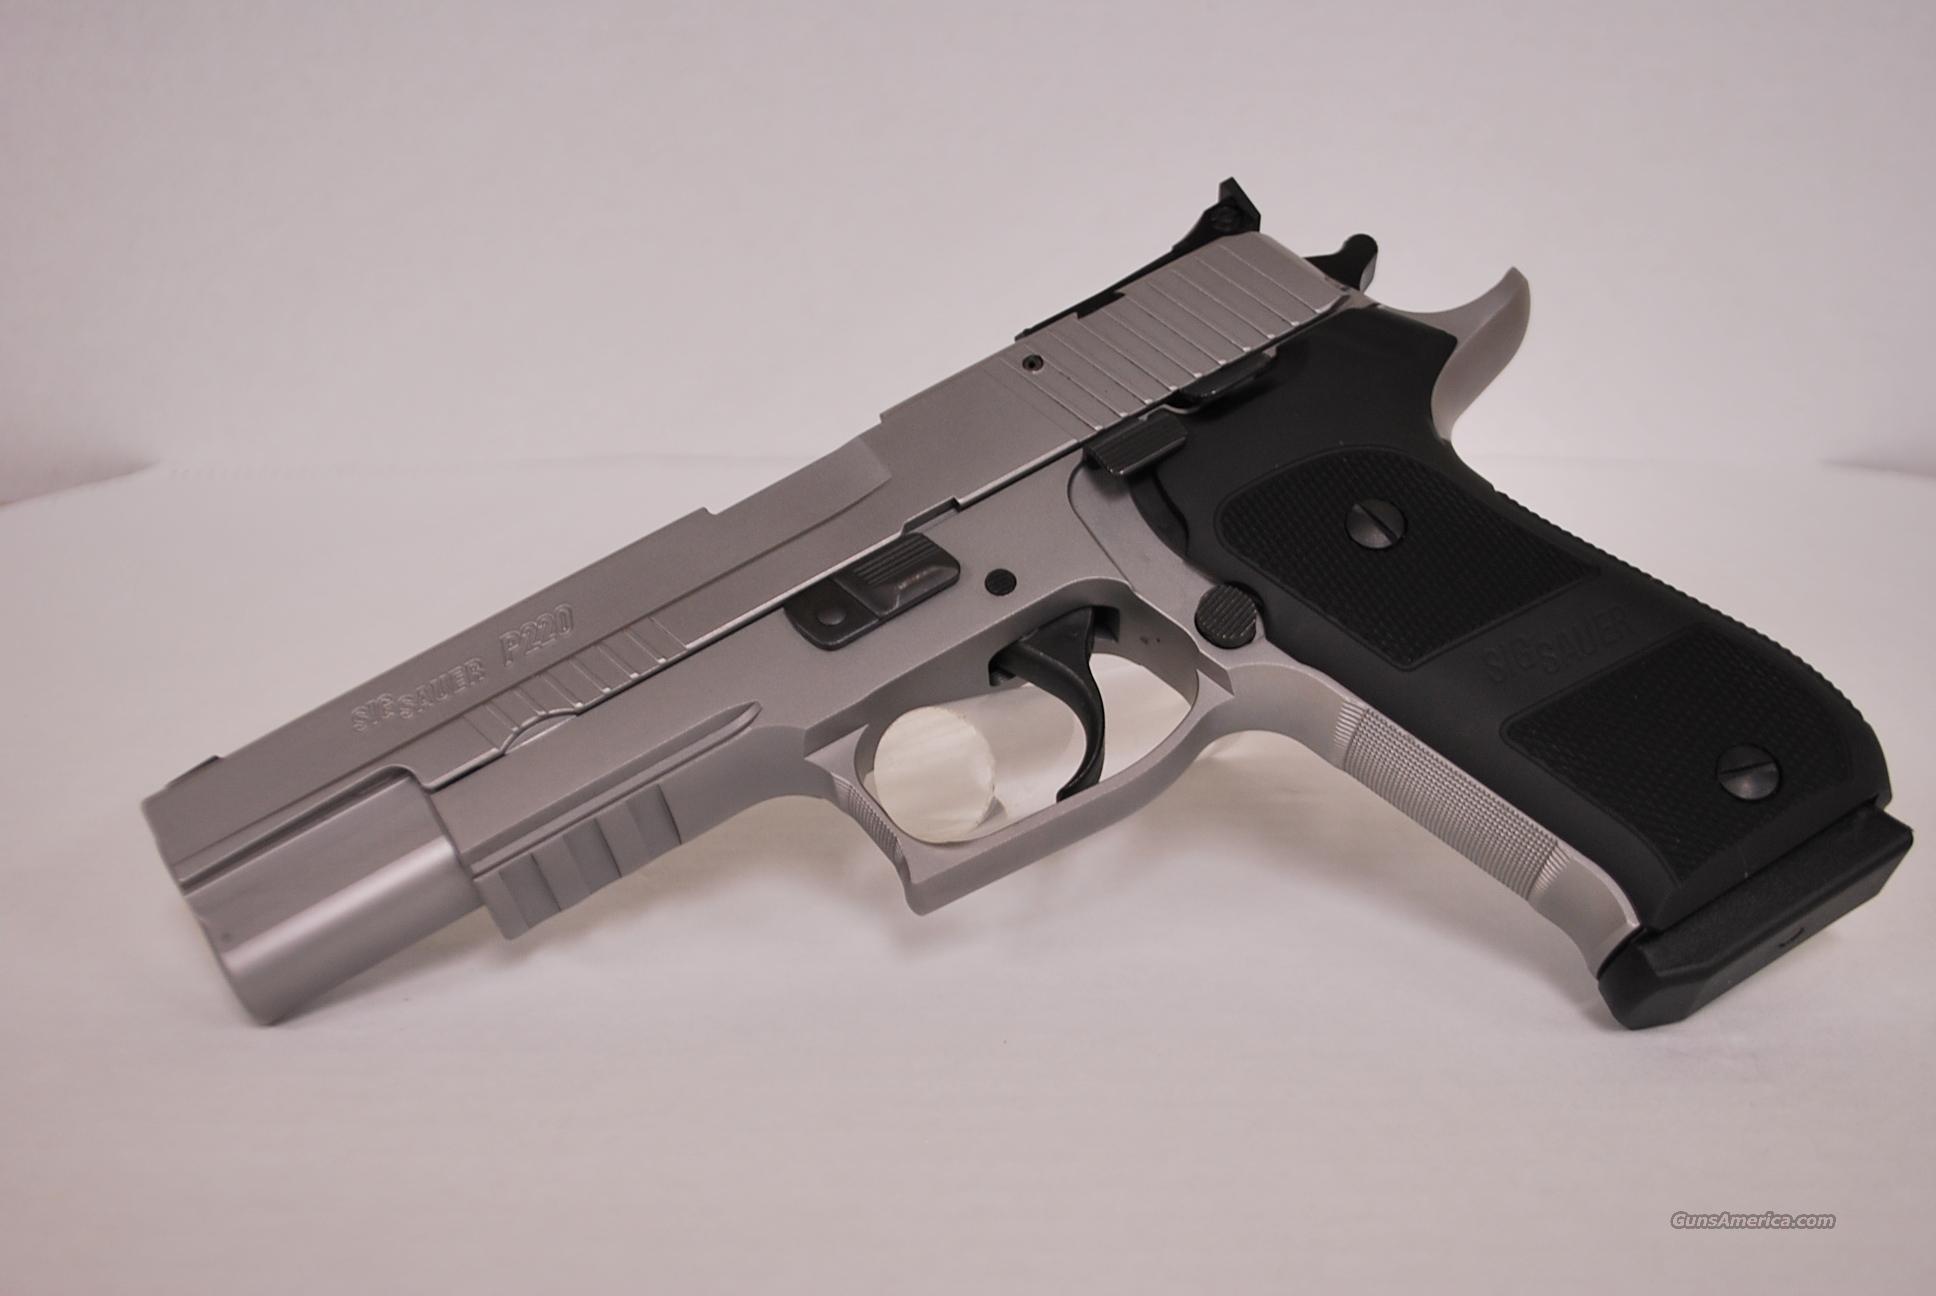 Sig Sauer P220 Match Elite .45 ACP  Guns > Pistols > Sig - Sauer/Sigarms Pistols > P220